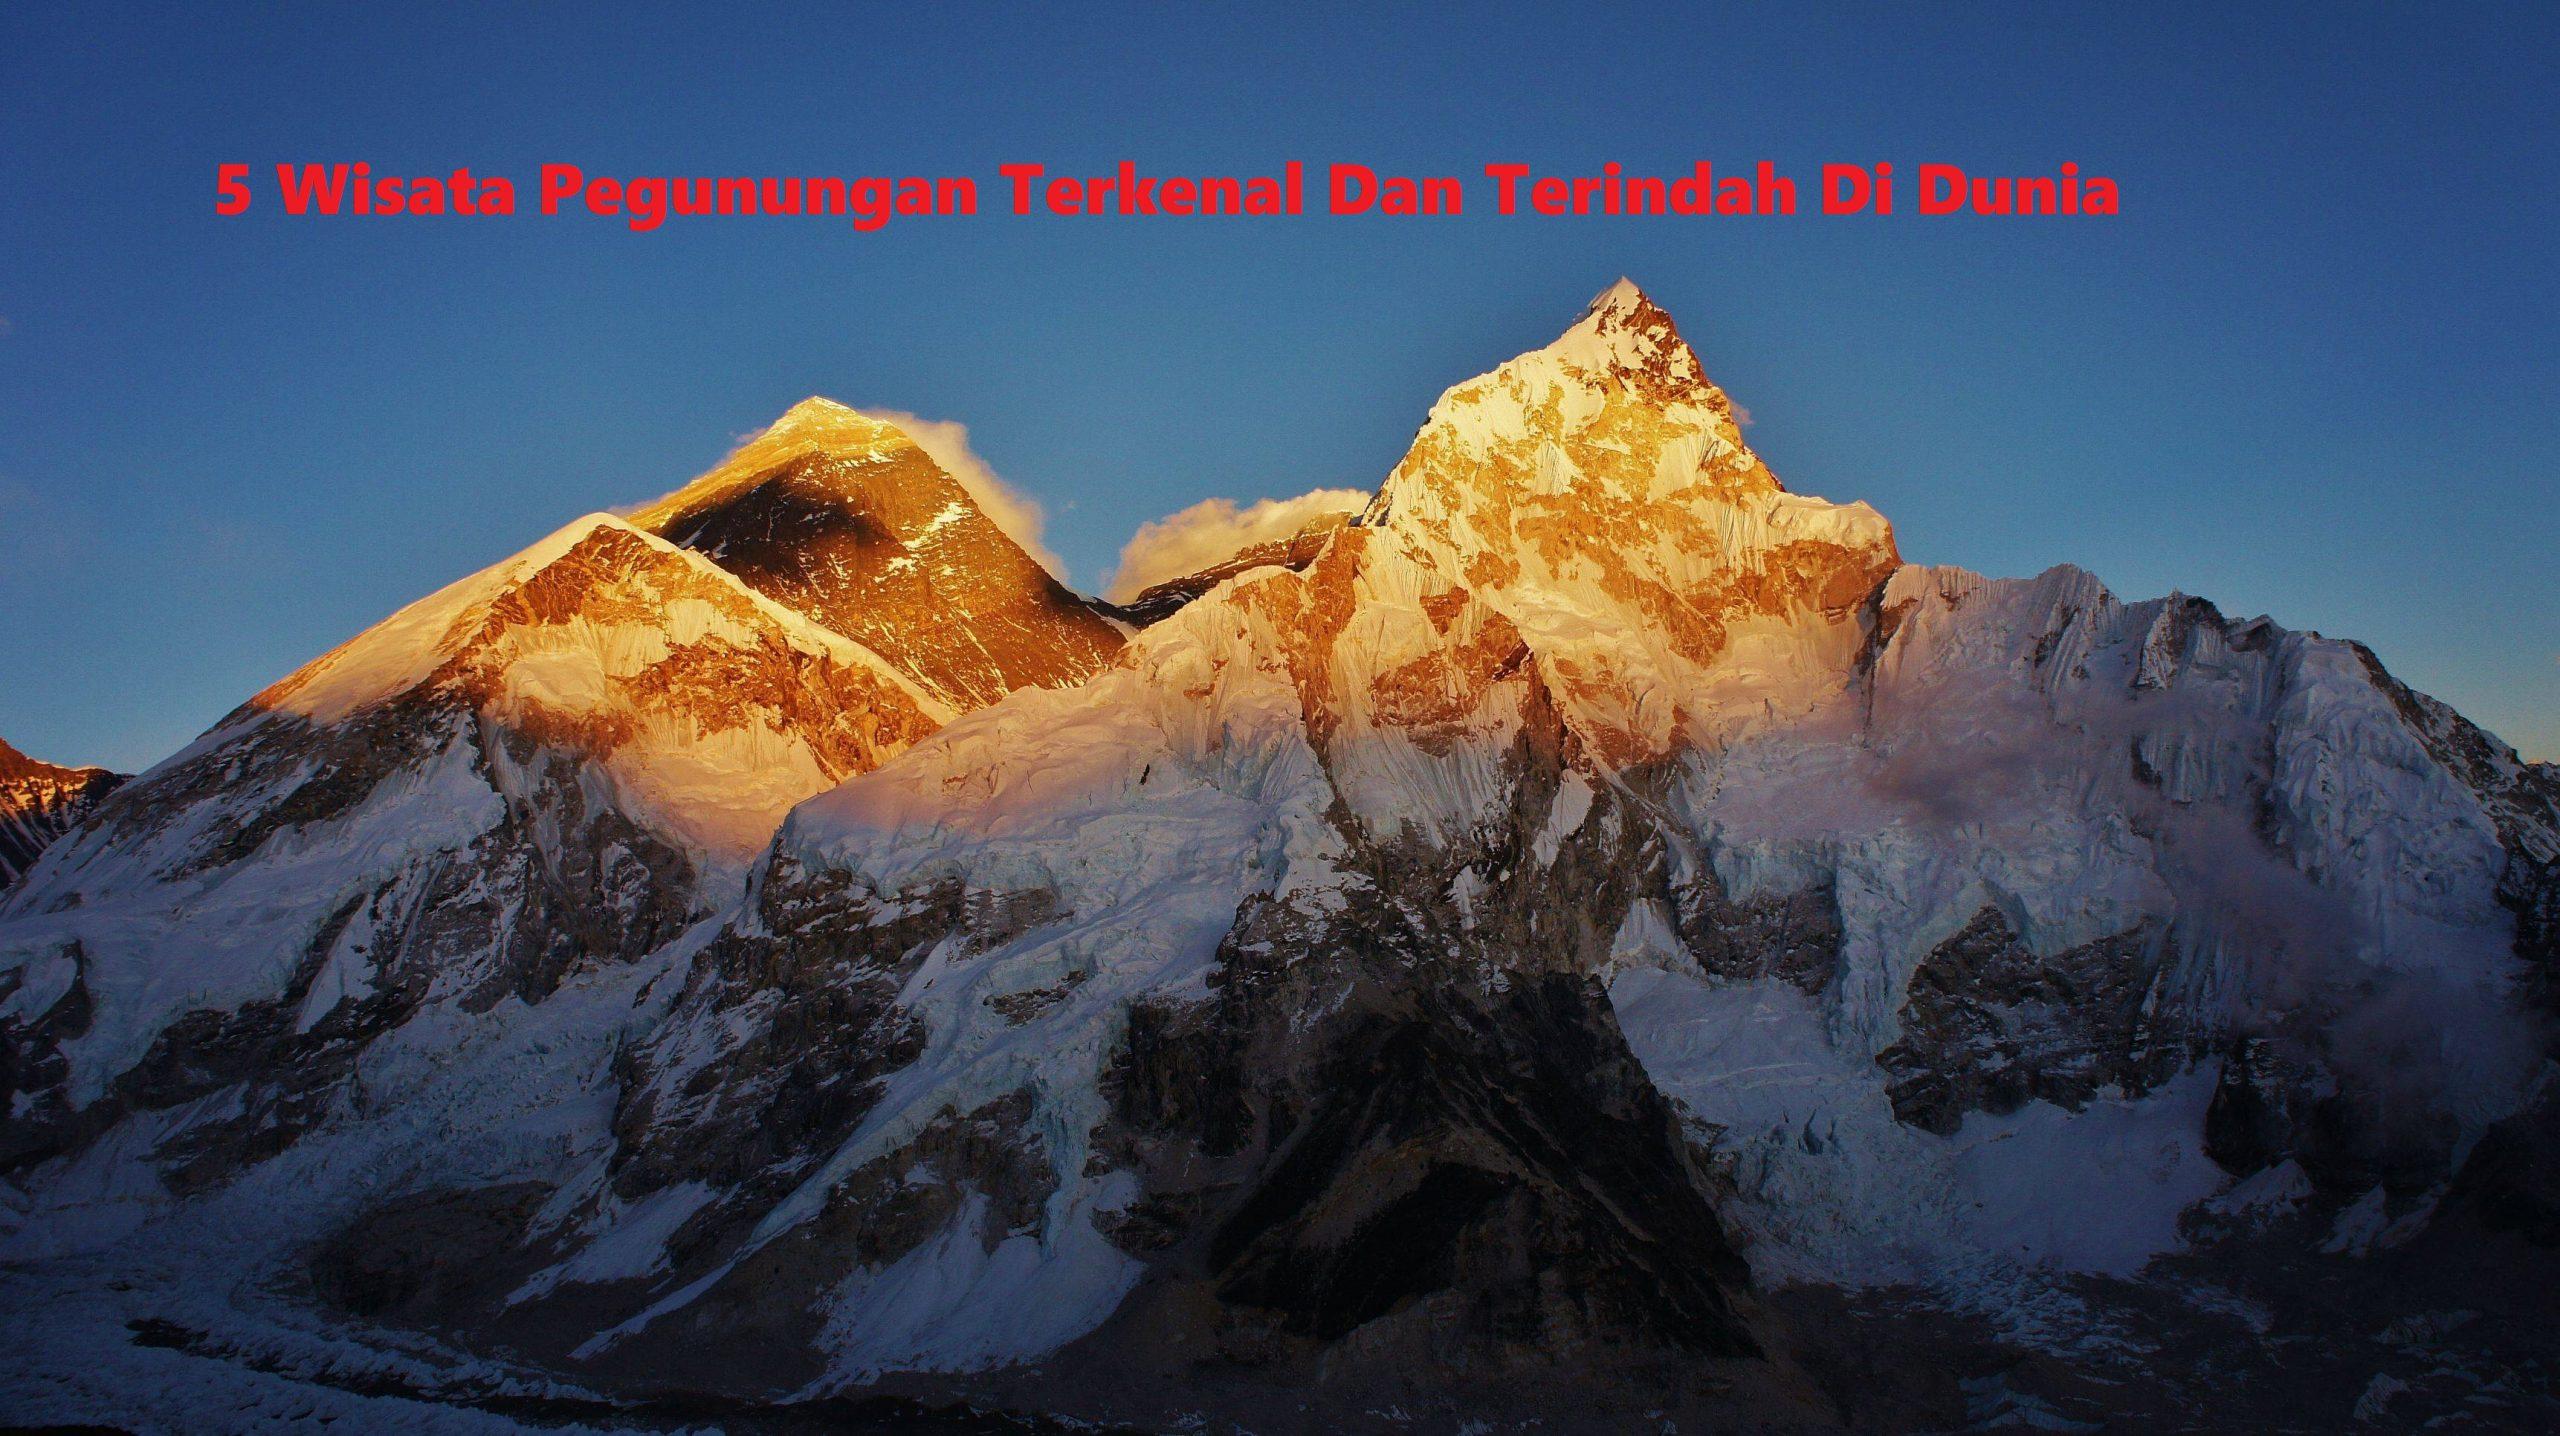 5 Wisata Pegunungan Terkenal Dan Terindah Di Dunia